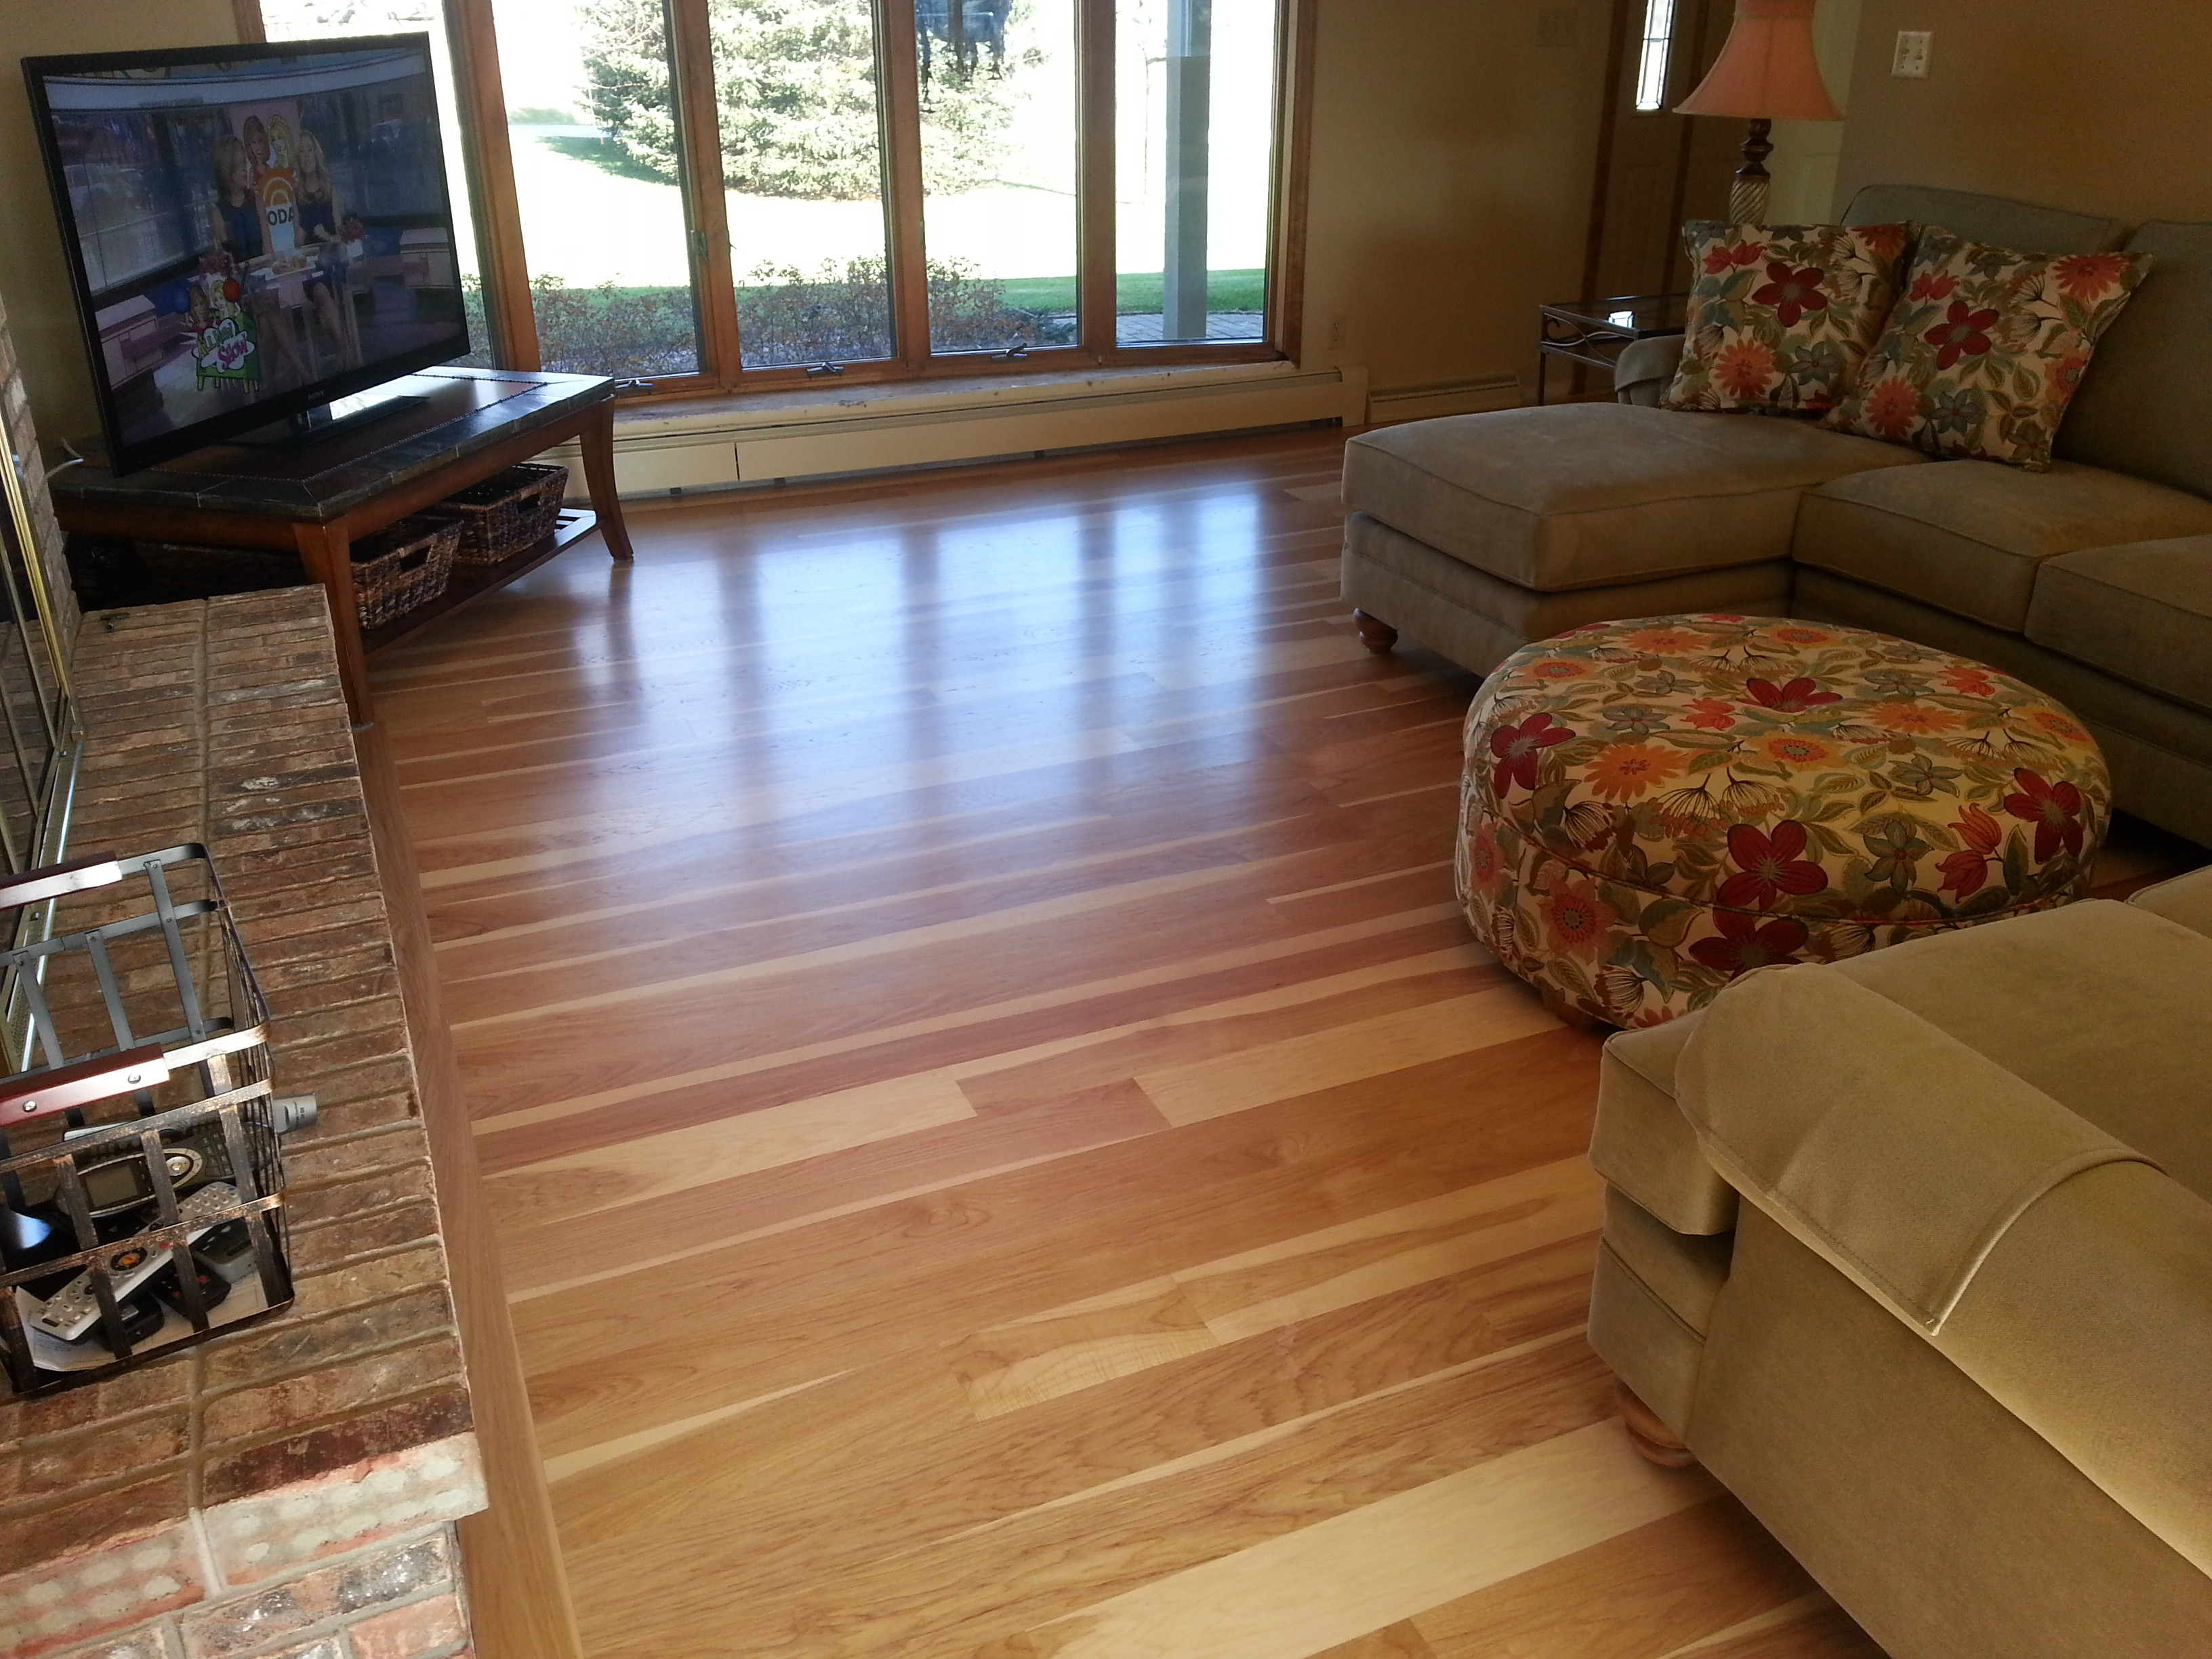 hardwood floor refinishing racine wi of custom hickory wide plank hardwood floor milwaukee wi my for custom hickory wide plank hardwood floor miwlaukee wi